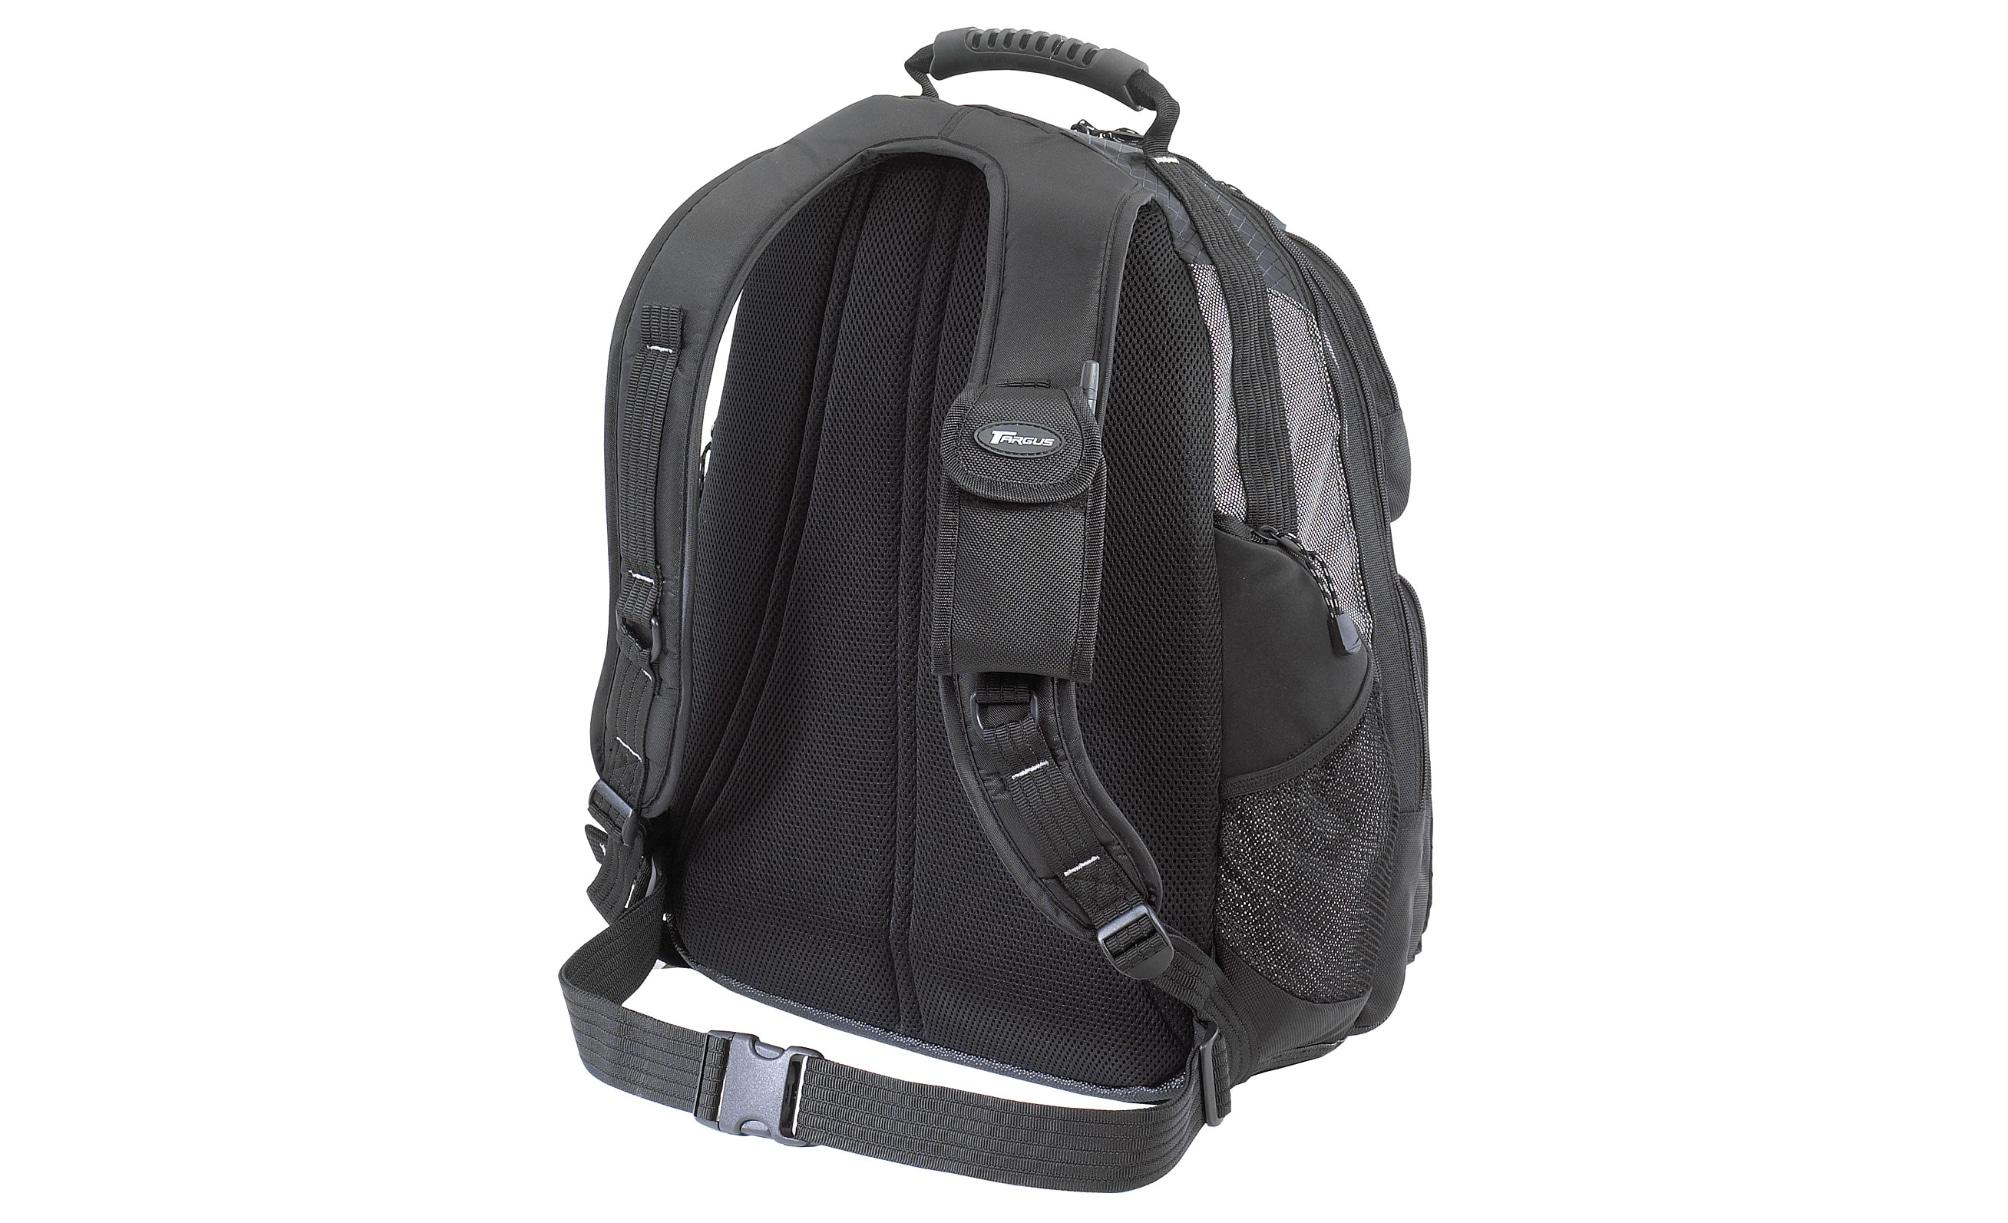 ae3391535 Targus Sport Standard Backpack for notebooks up to 15.4